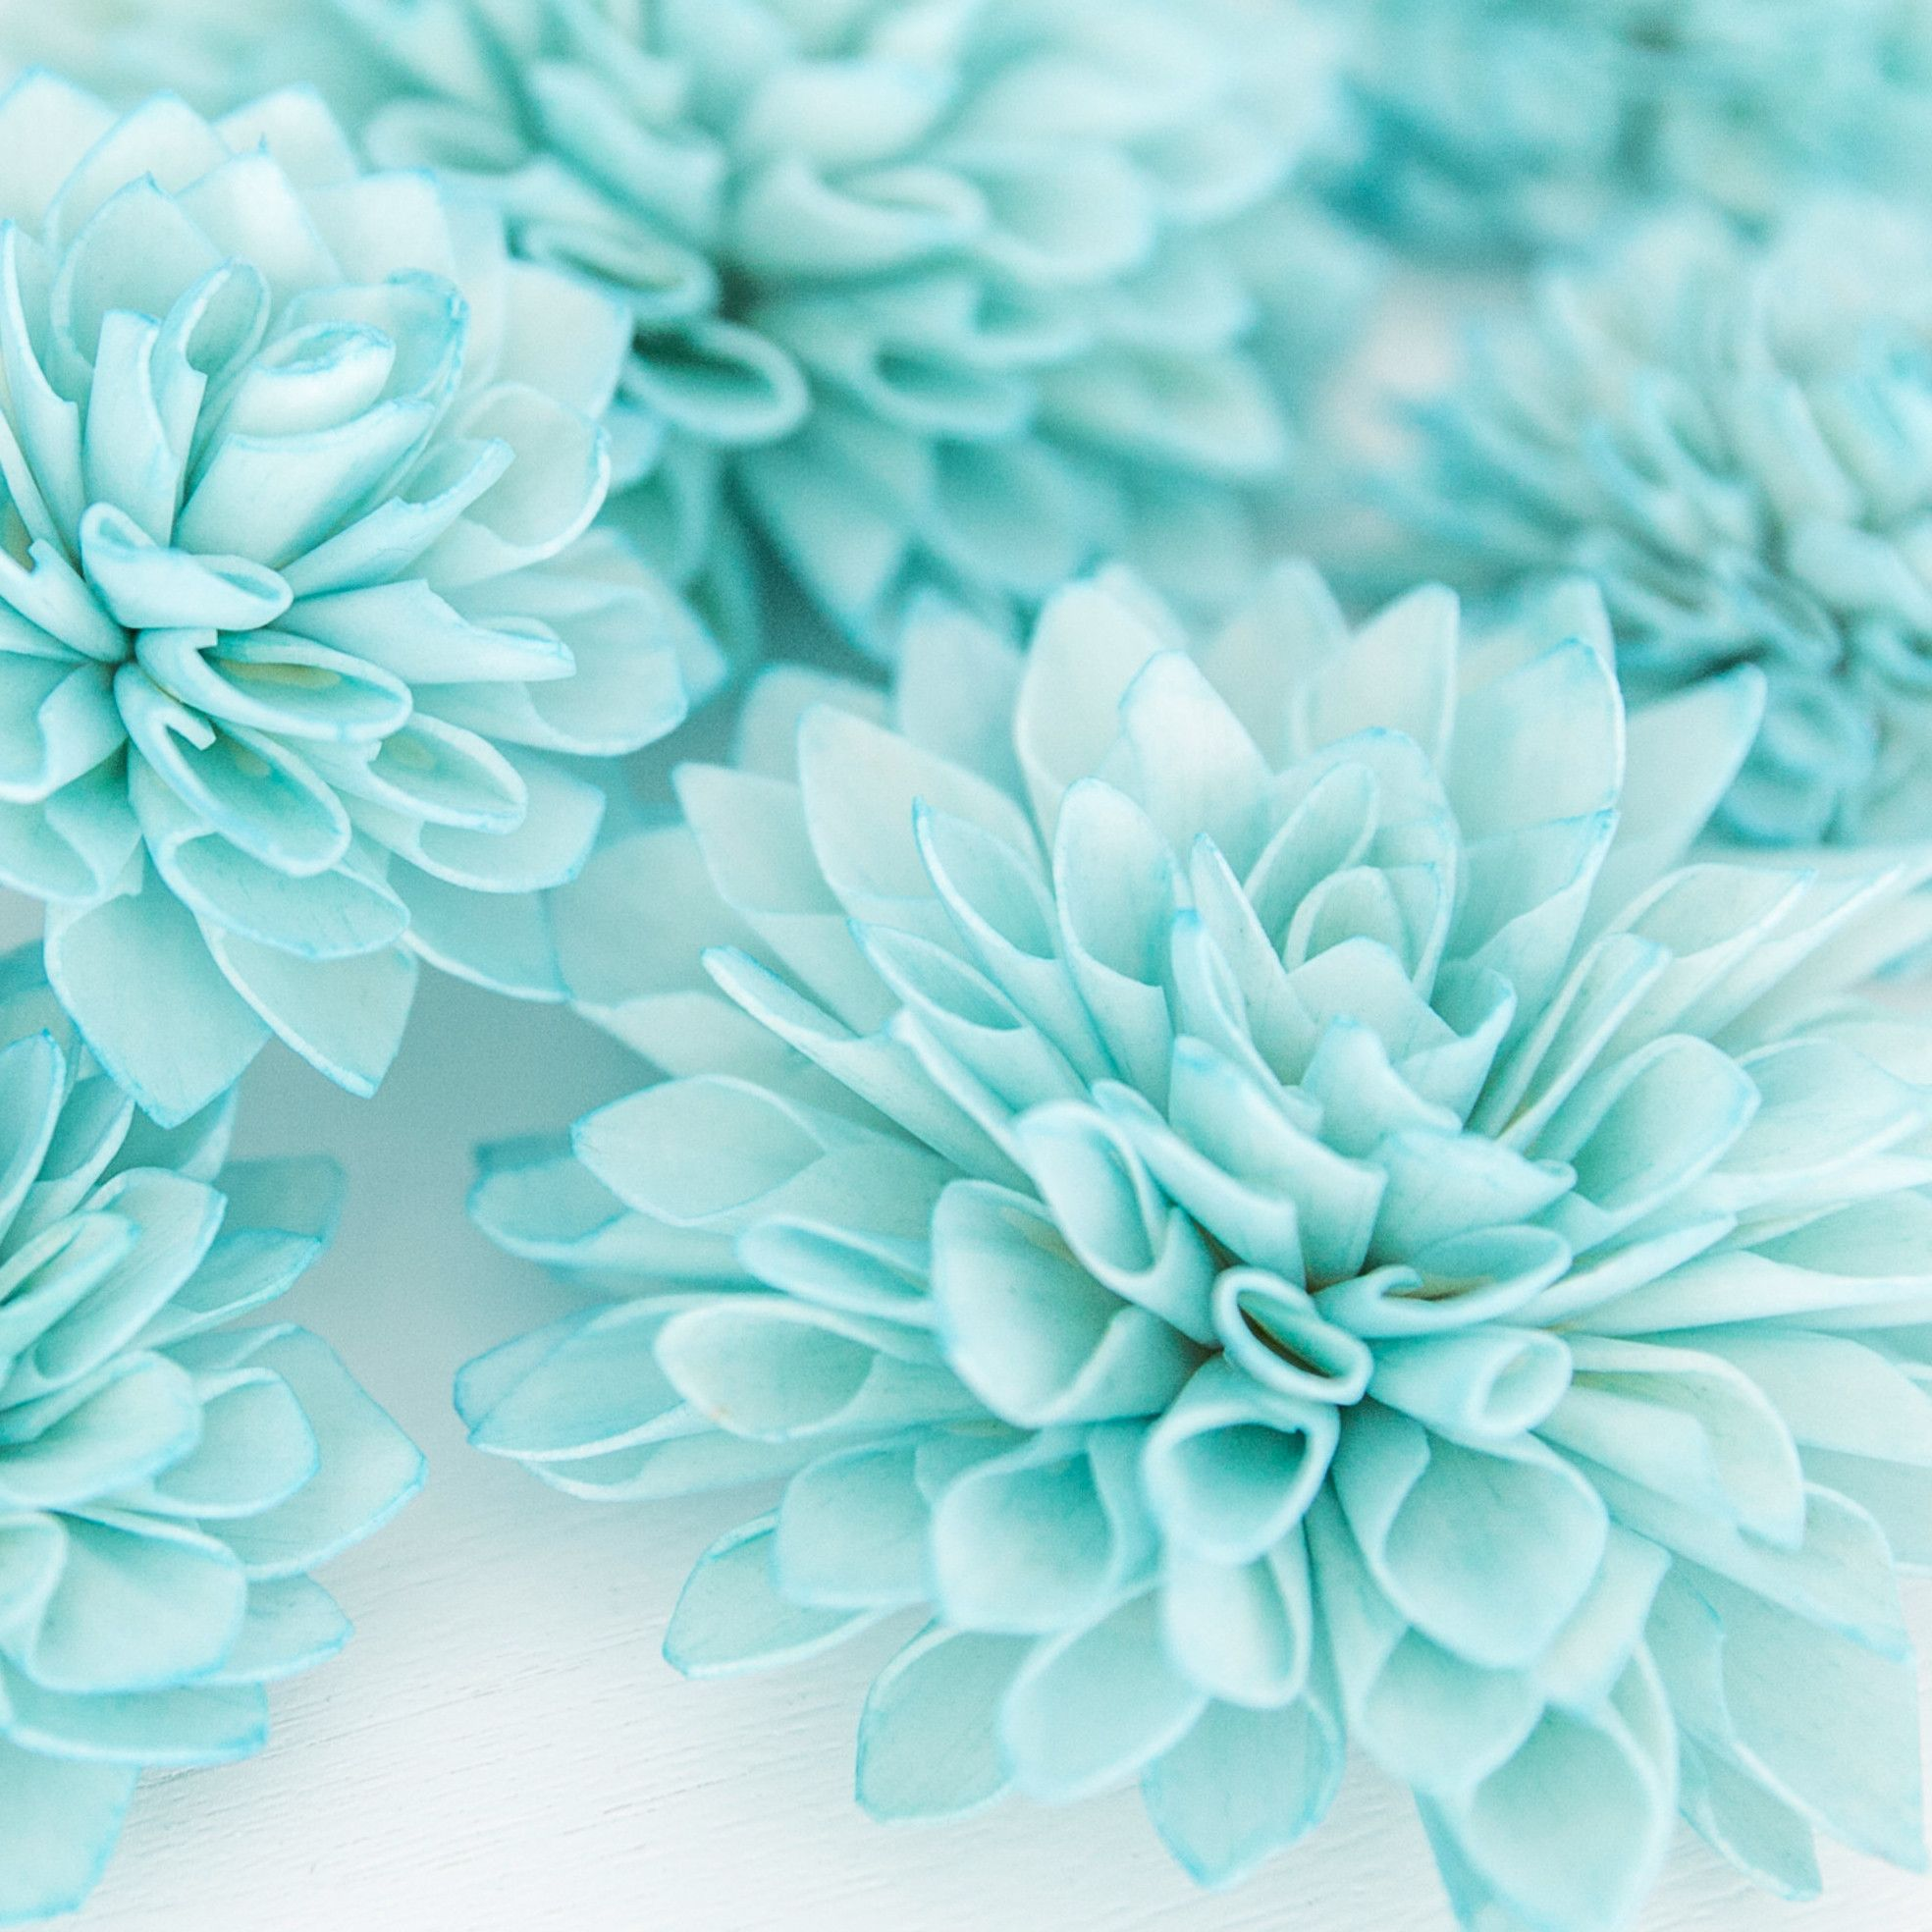 10 Aquamarine Wooden Flowers Wedding Decorations Wedding